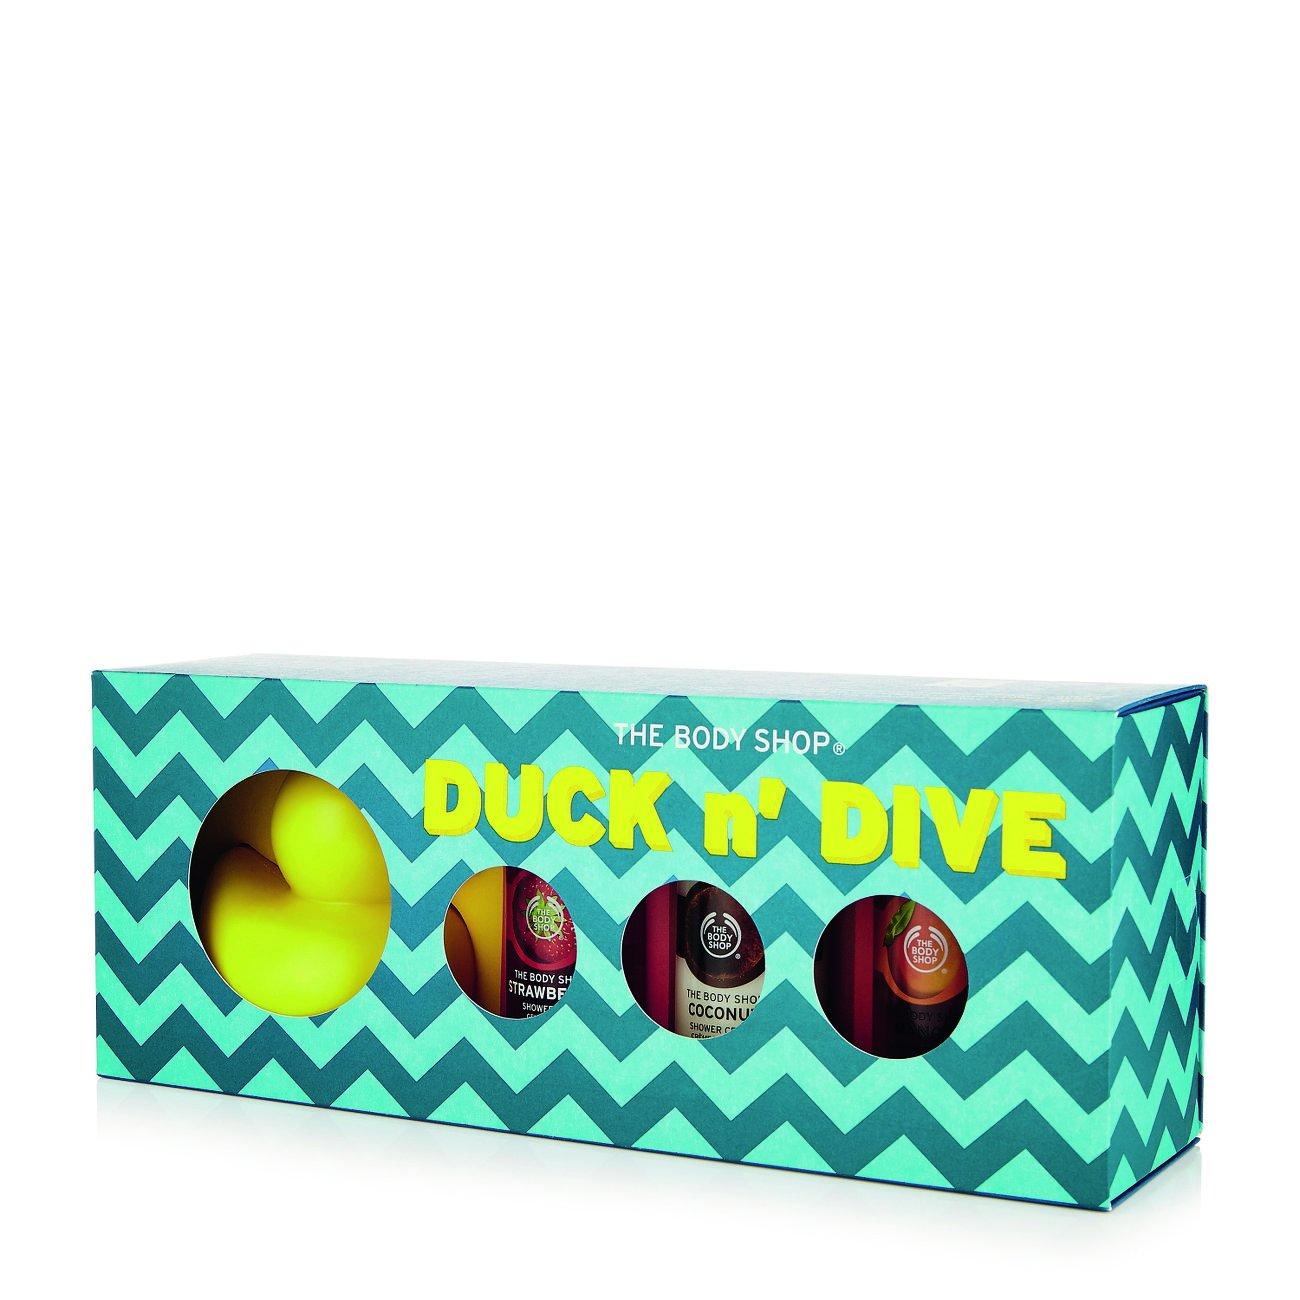 Amazon Prime: The Body Shop Duck 'n' Dive 4-Pc Body Shop $4.62 + Free Shipping